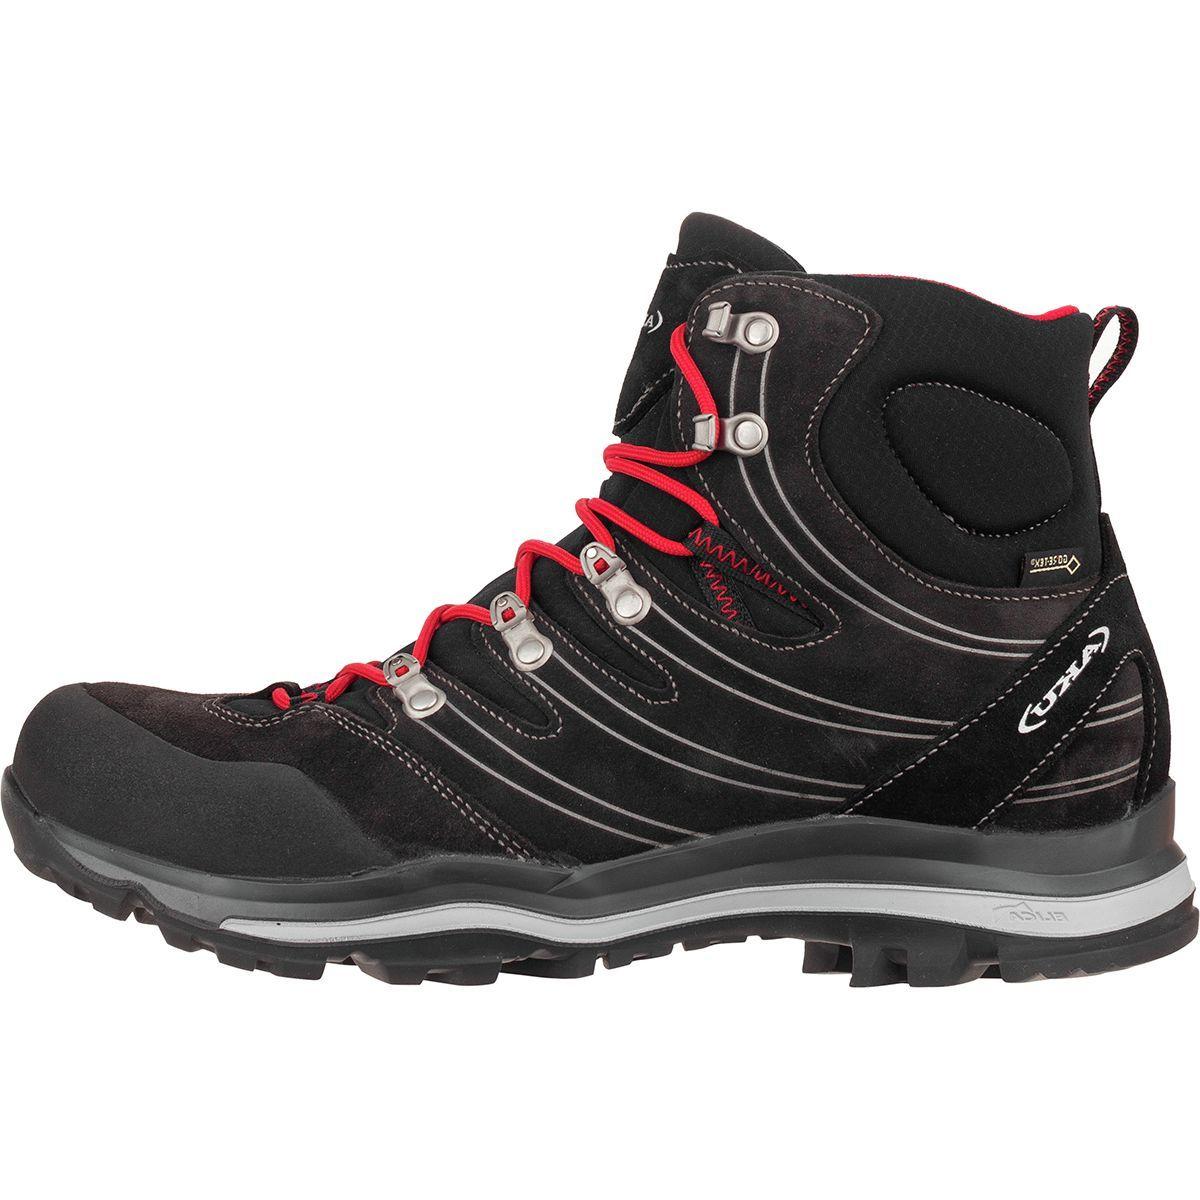 AKU Alterra GTX Hiking Boot - Men's